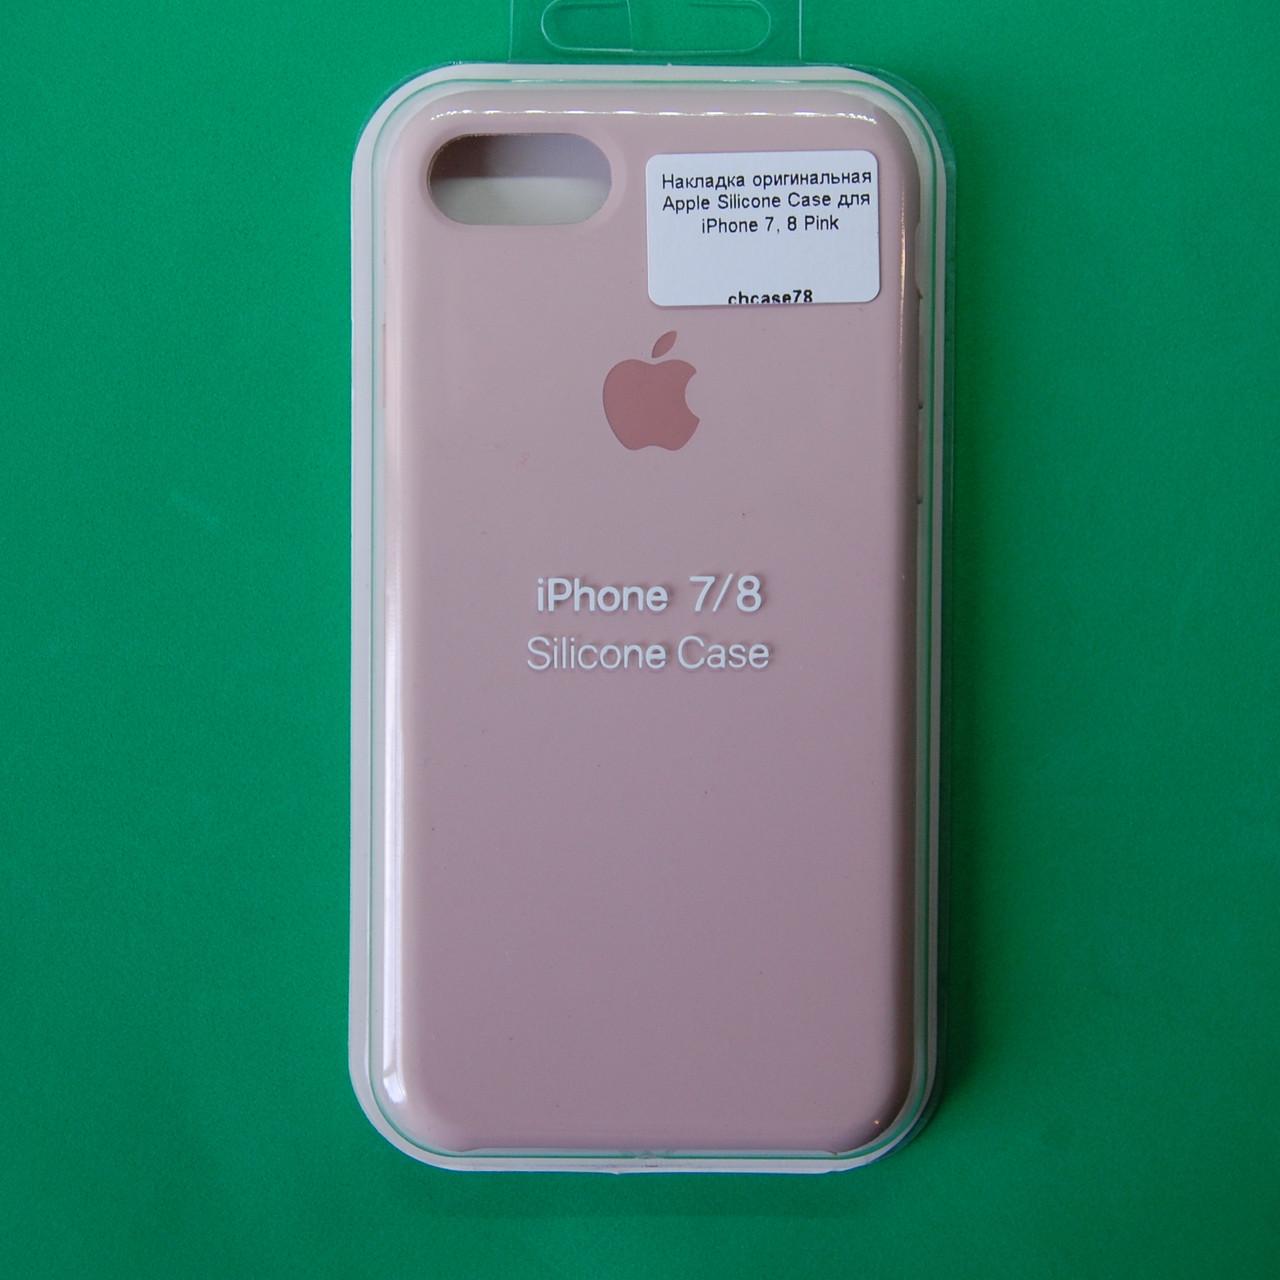 "Накладка оригинальная ""Apple Silicone Case"" для iPhone 7, 8 Pink Sand"